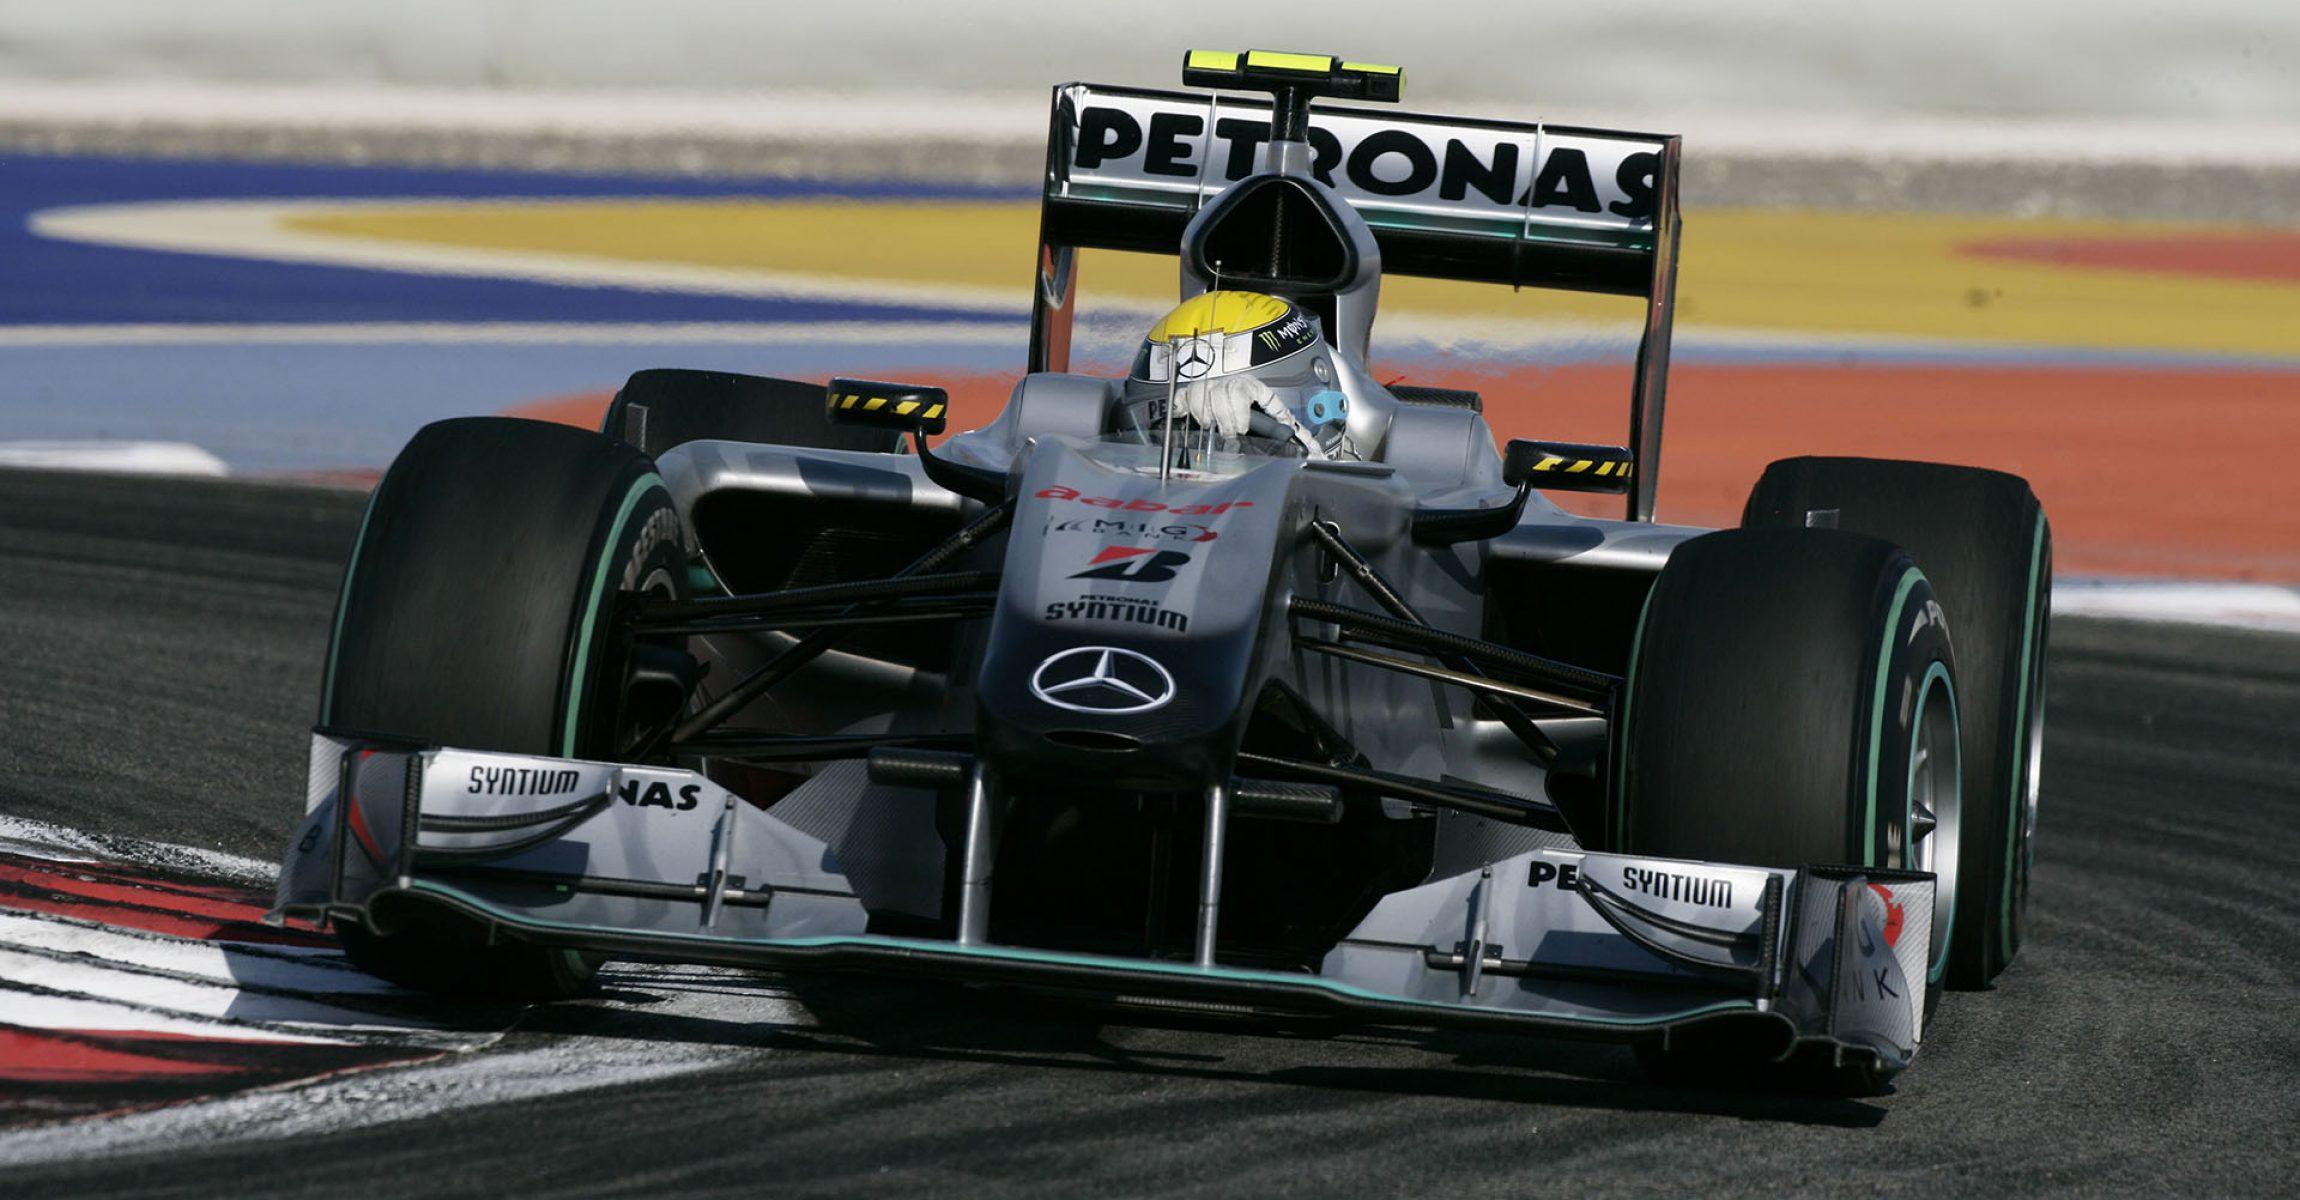 2010 Bahrain Grand Prix, Sunday Nico Rosberg, Mercedes